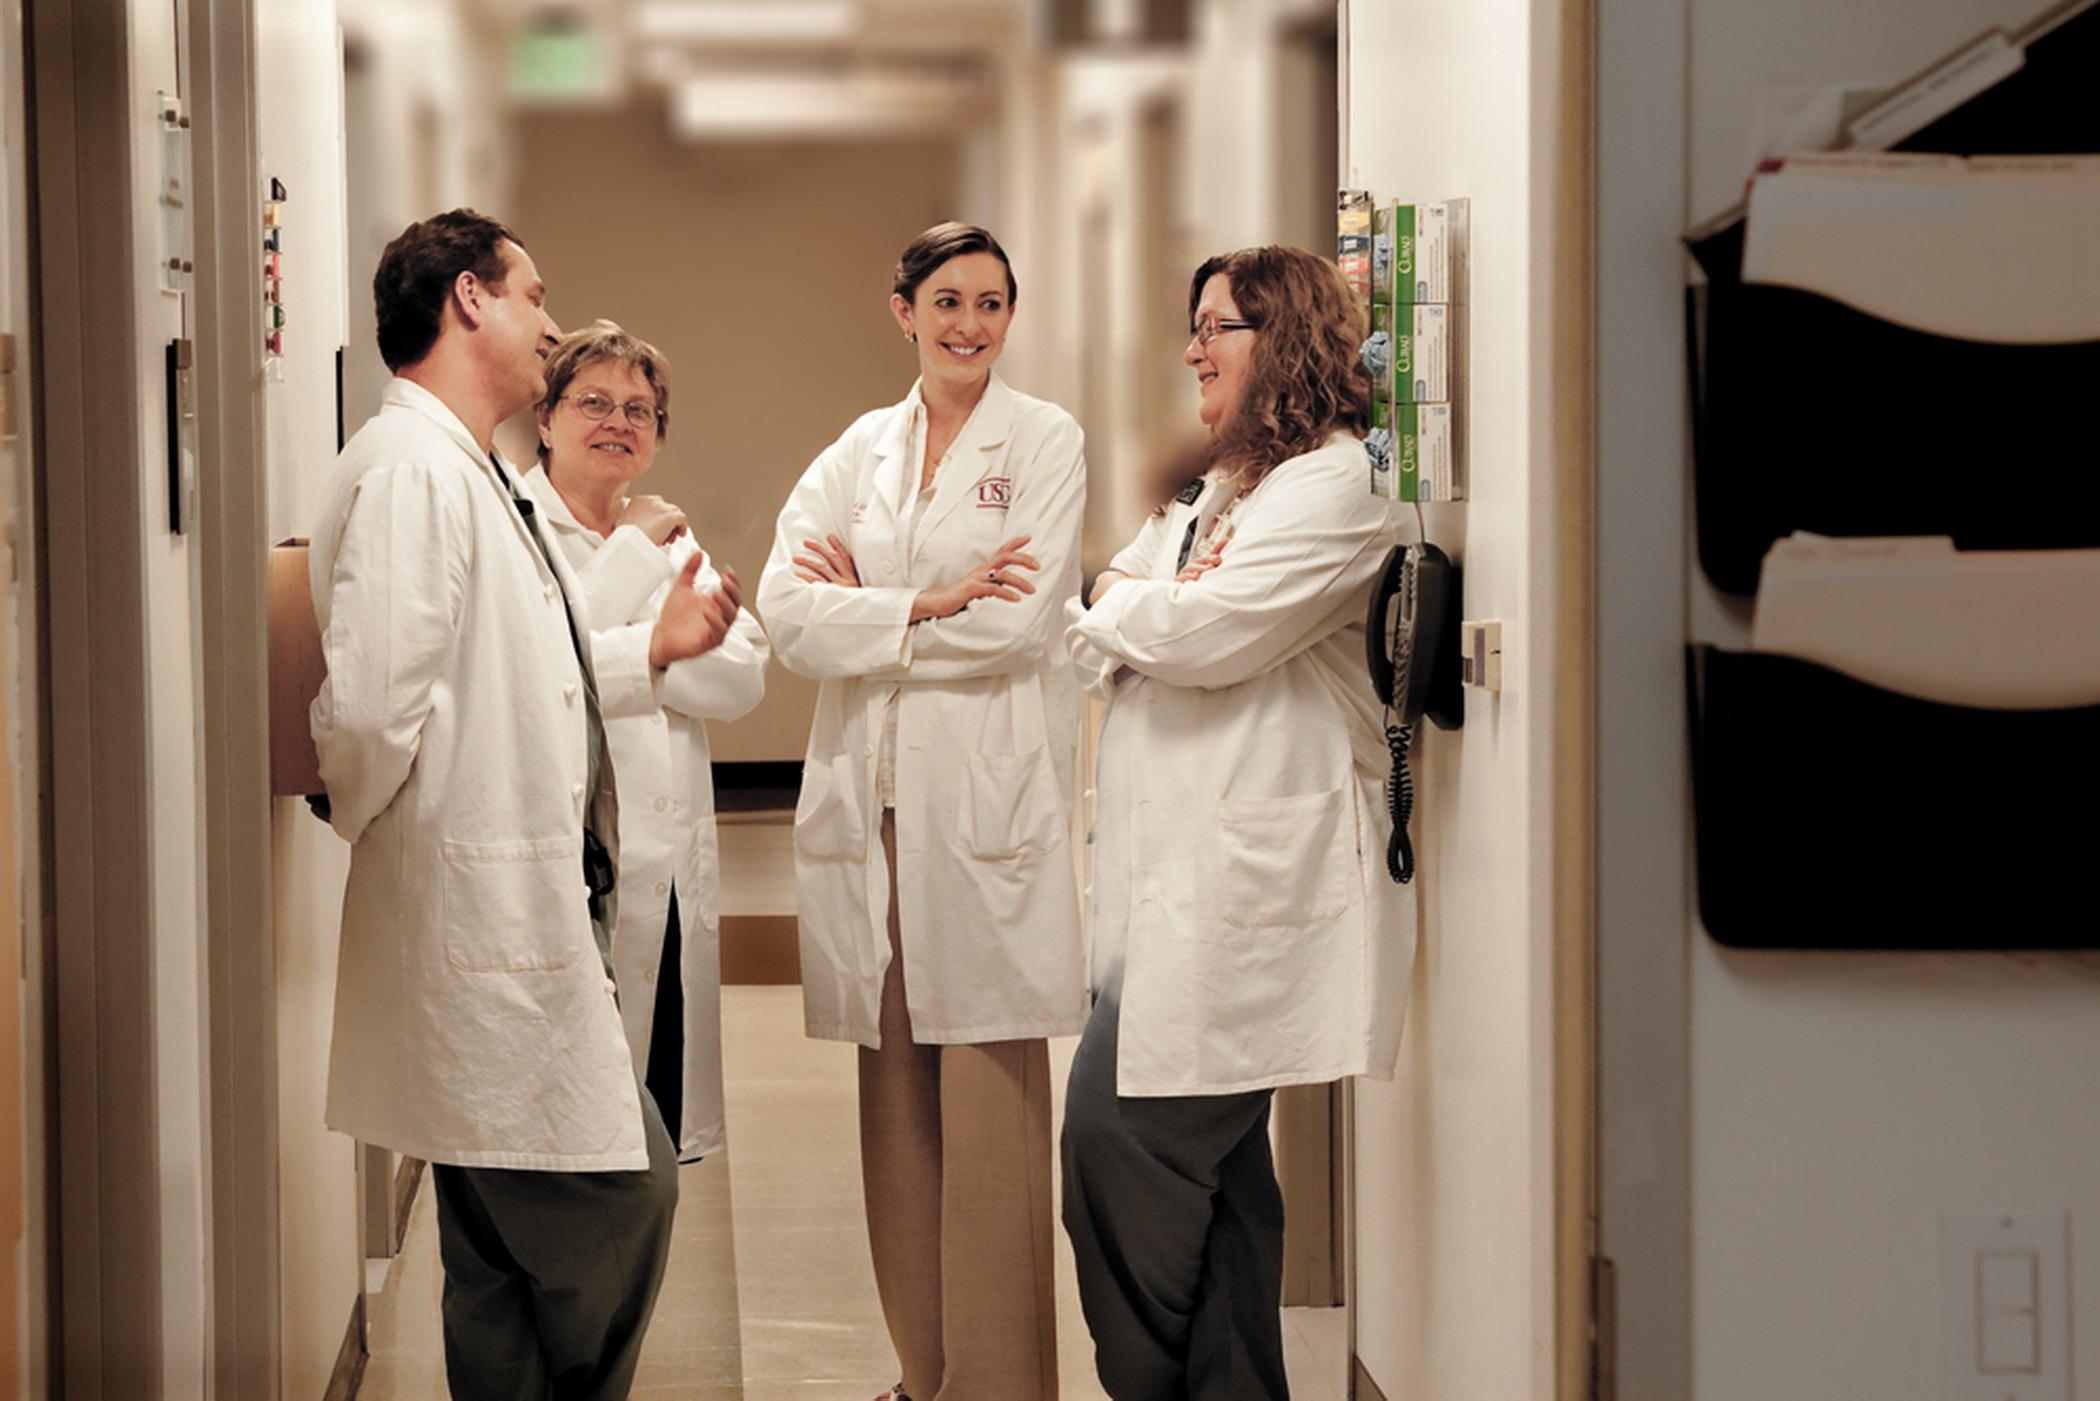 USC-hospital-hallway_MG_2678